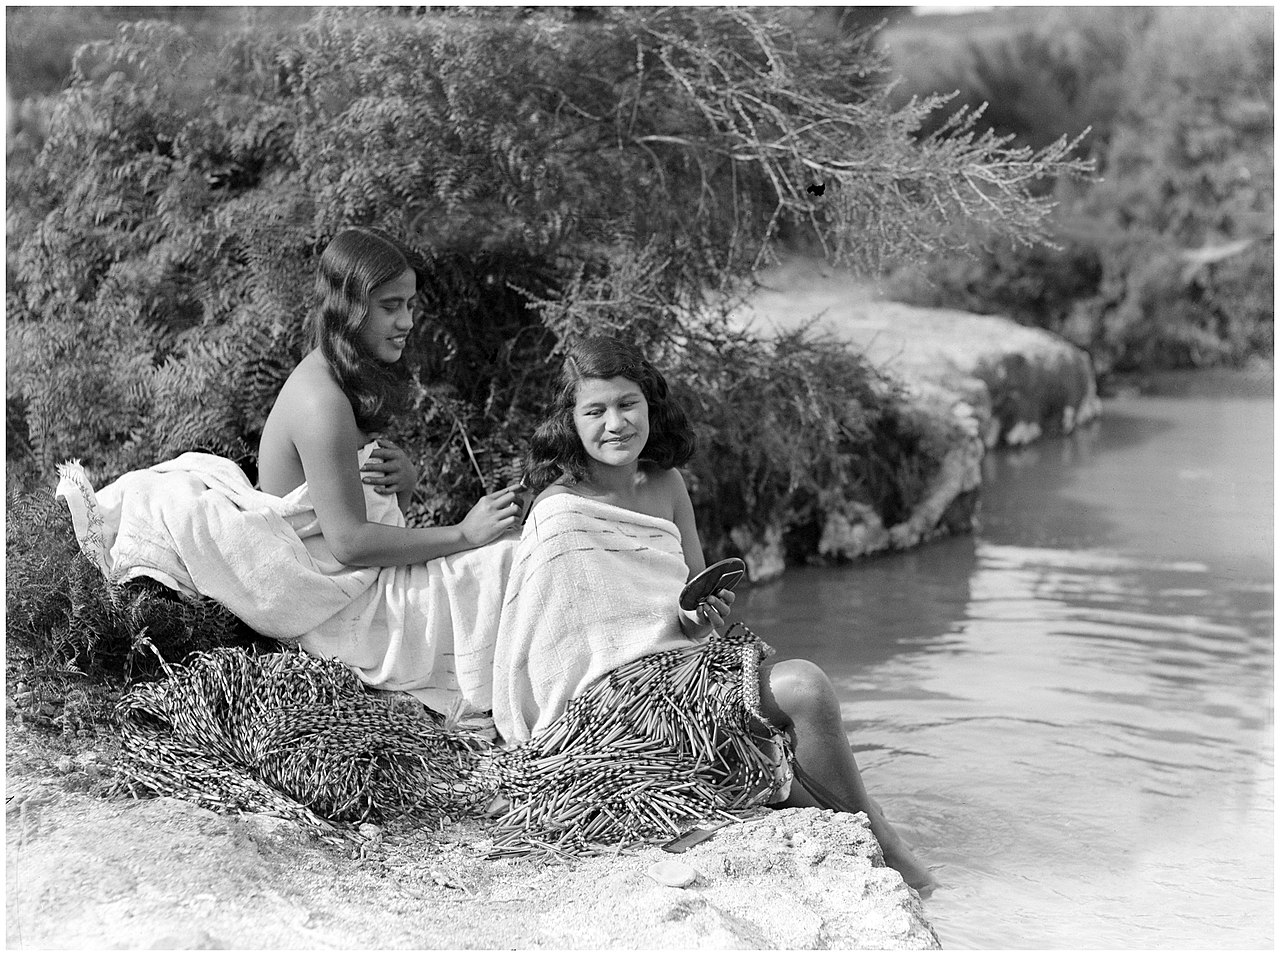 File:Two Maori women bathing at the Waikato River, 1938 ...